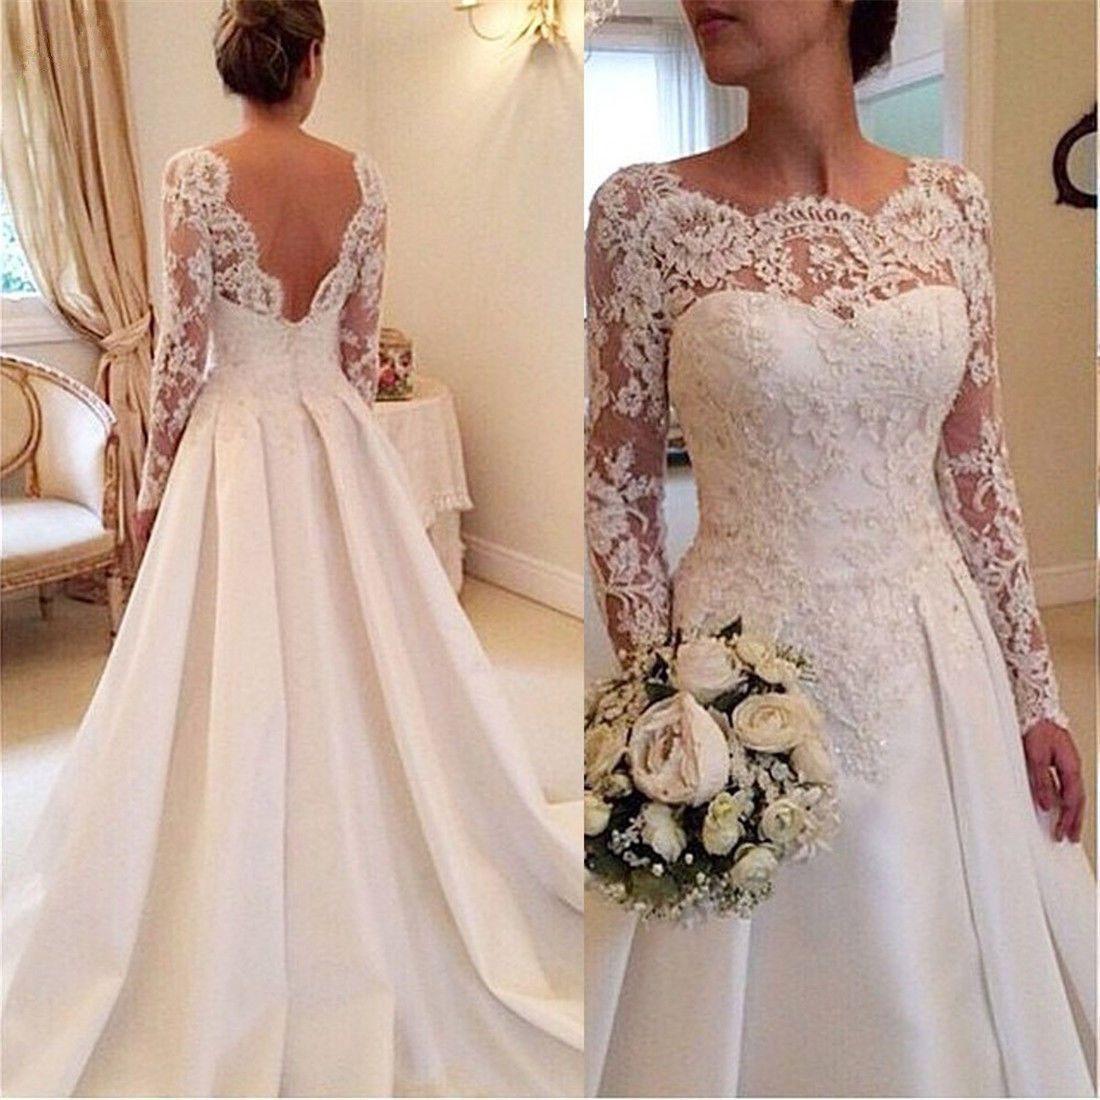 New White Ivory Lace A Line Wedding Dress Bridal Gown Custom Size 8 10 12 14 16 Long Sleeve Wedding Dress Lace Wedding Dress Long Sleeve Wedding Dresses Satin